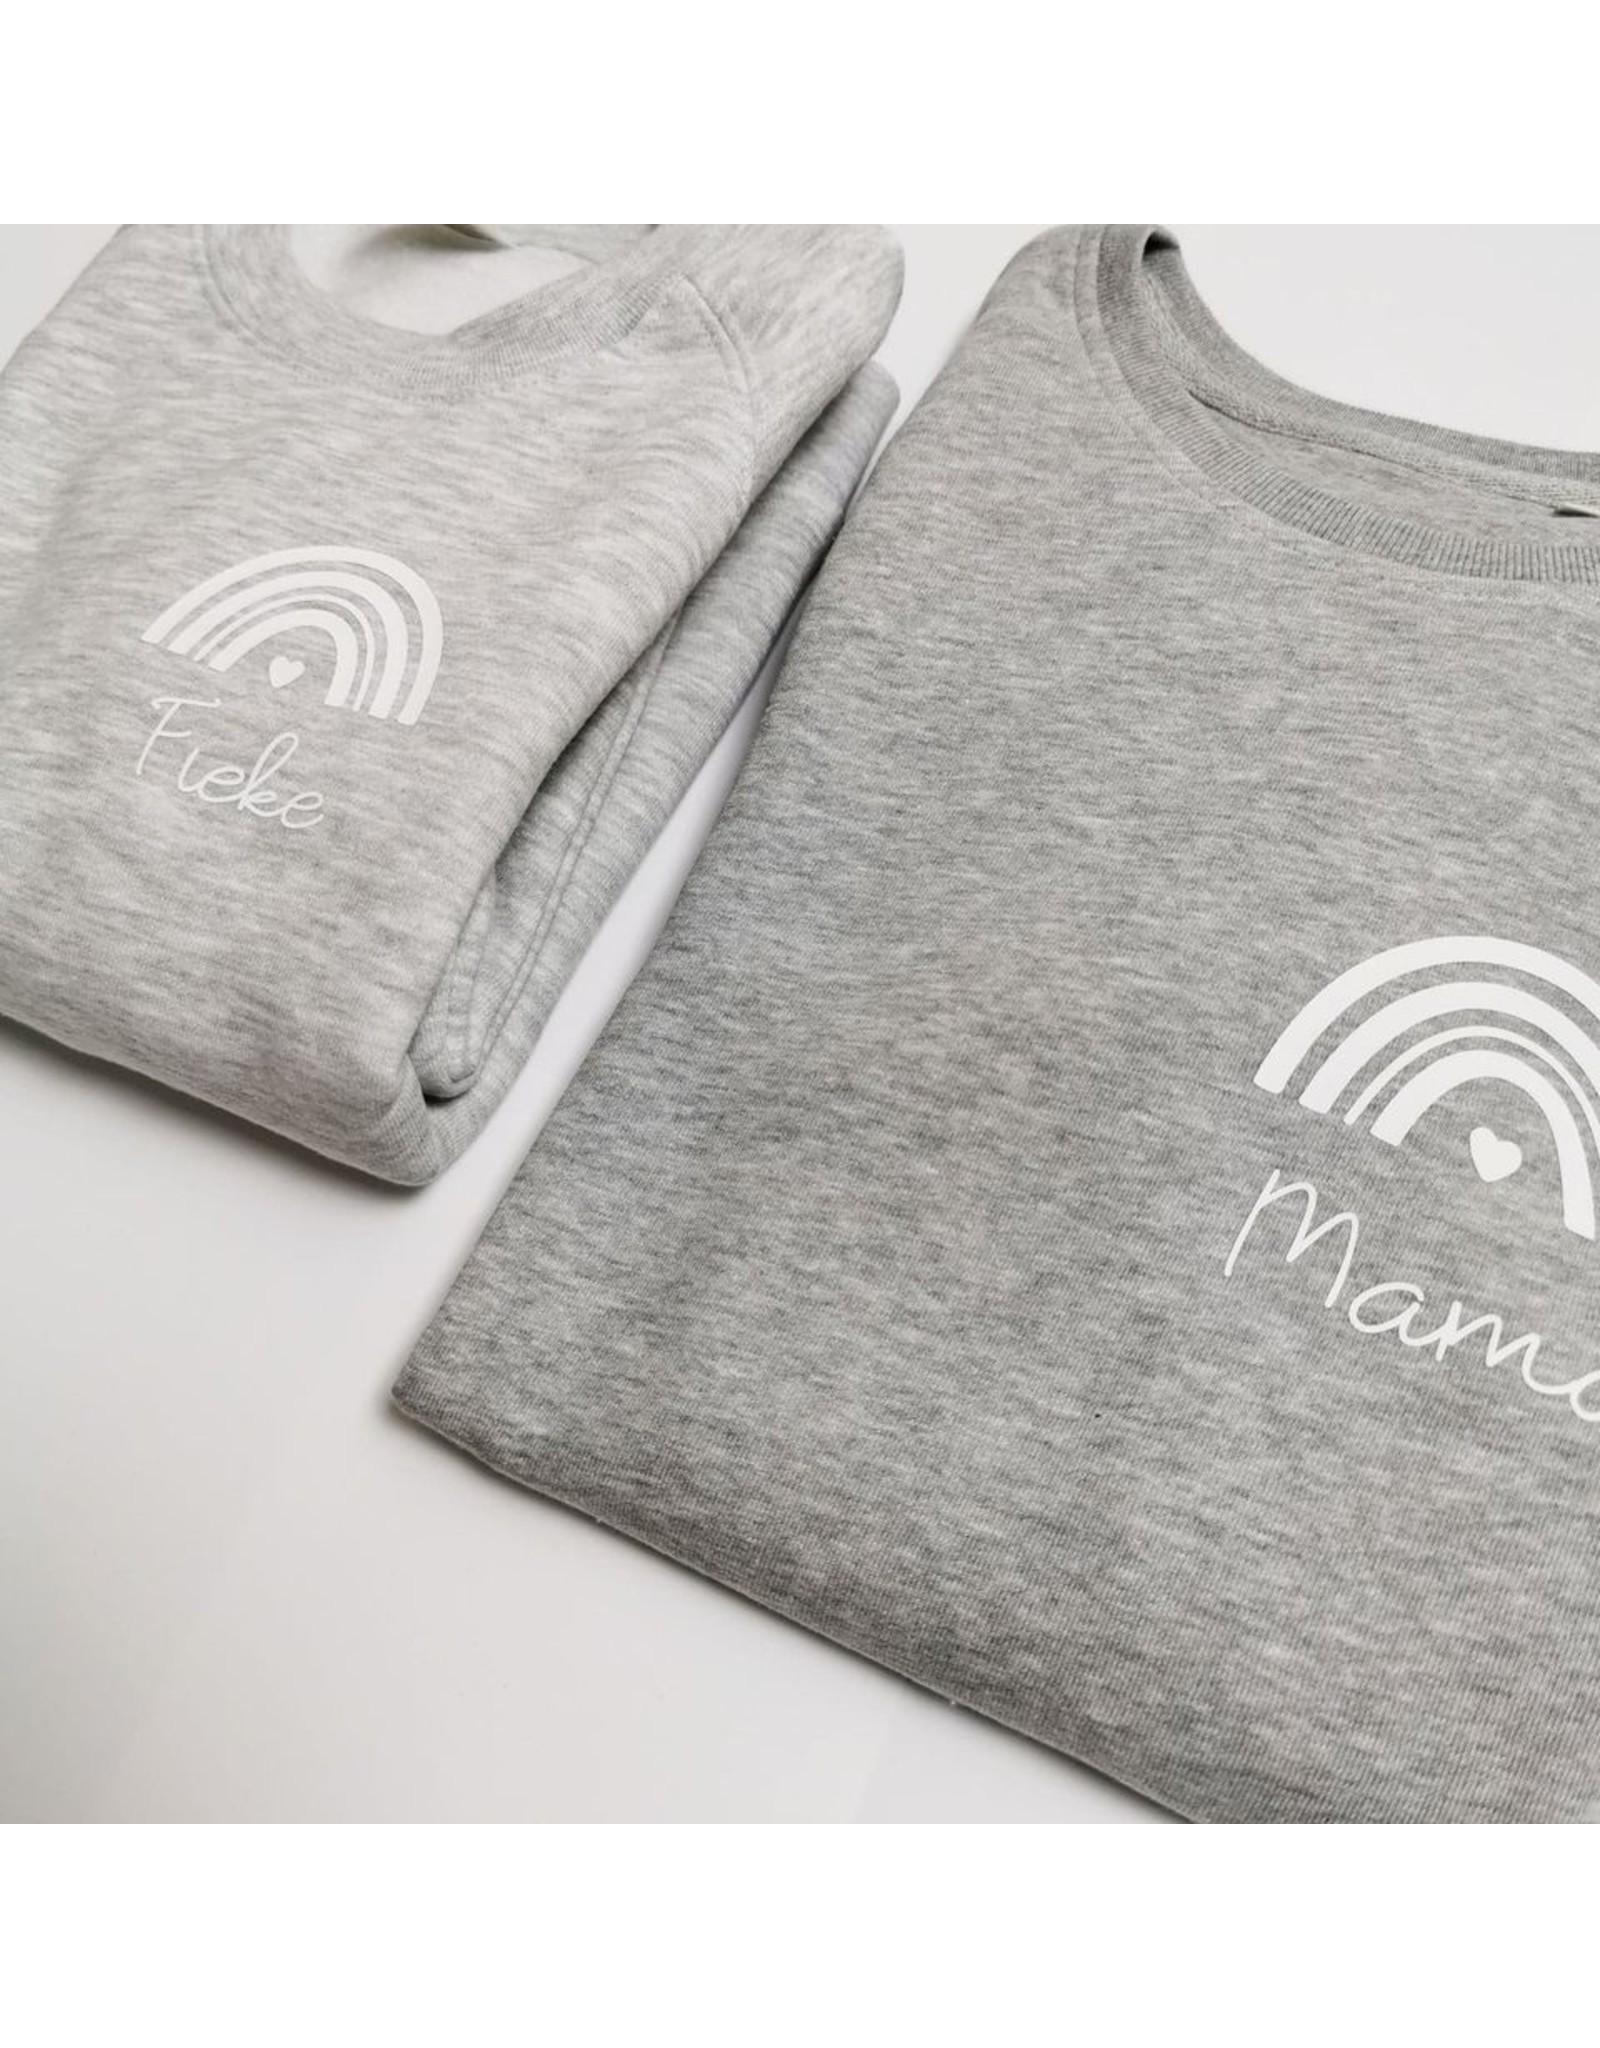 Twinning sweater